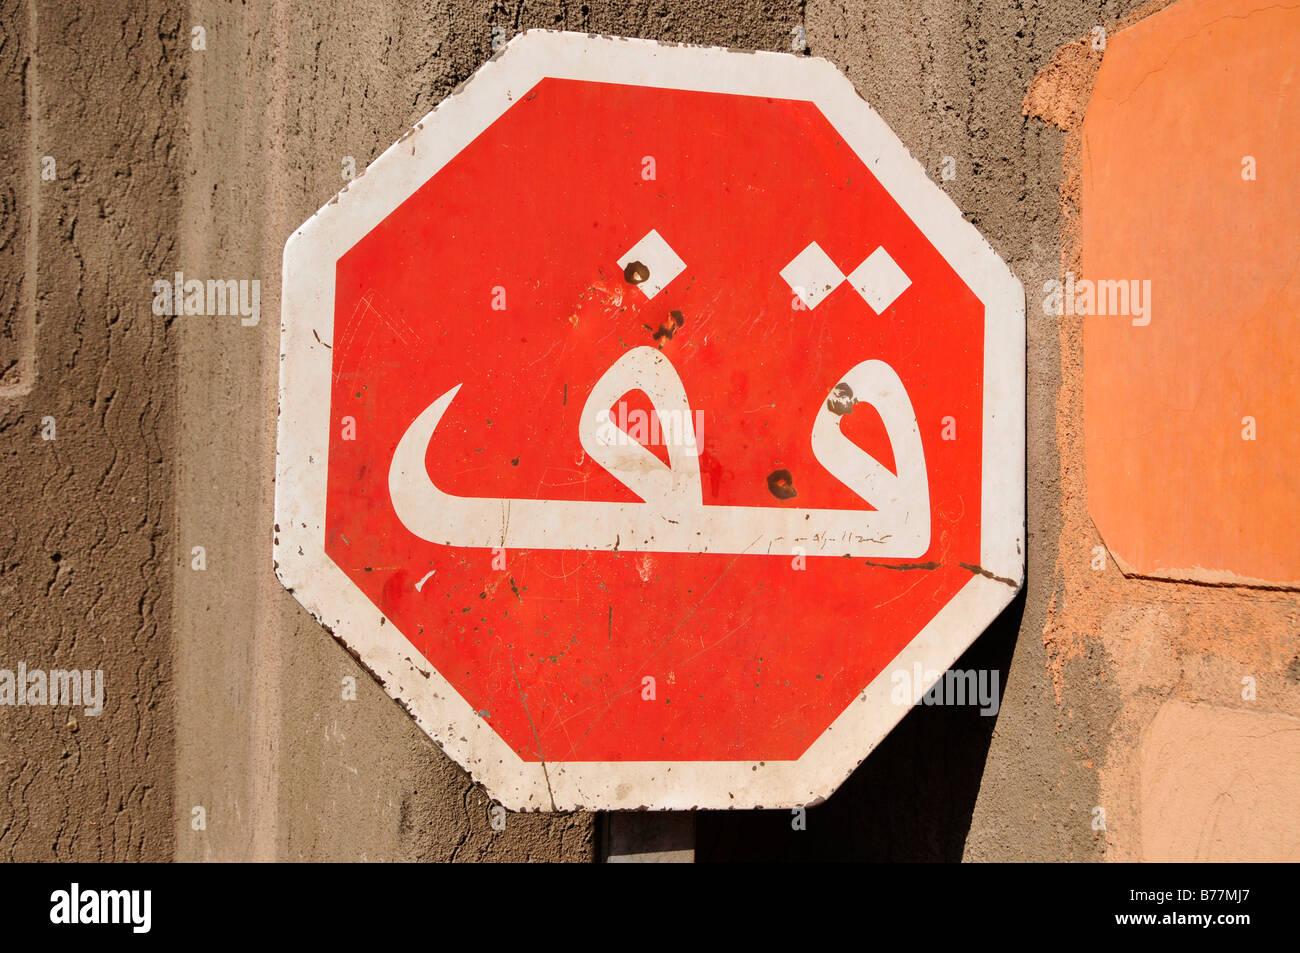 Stop-Schild in Arabisch, Marrakesch, Marokko, Afrika Stockbild